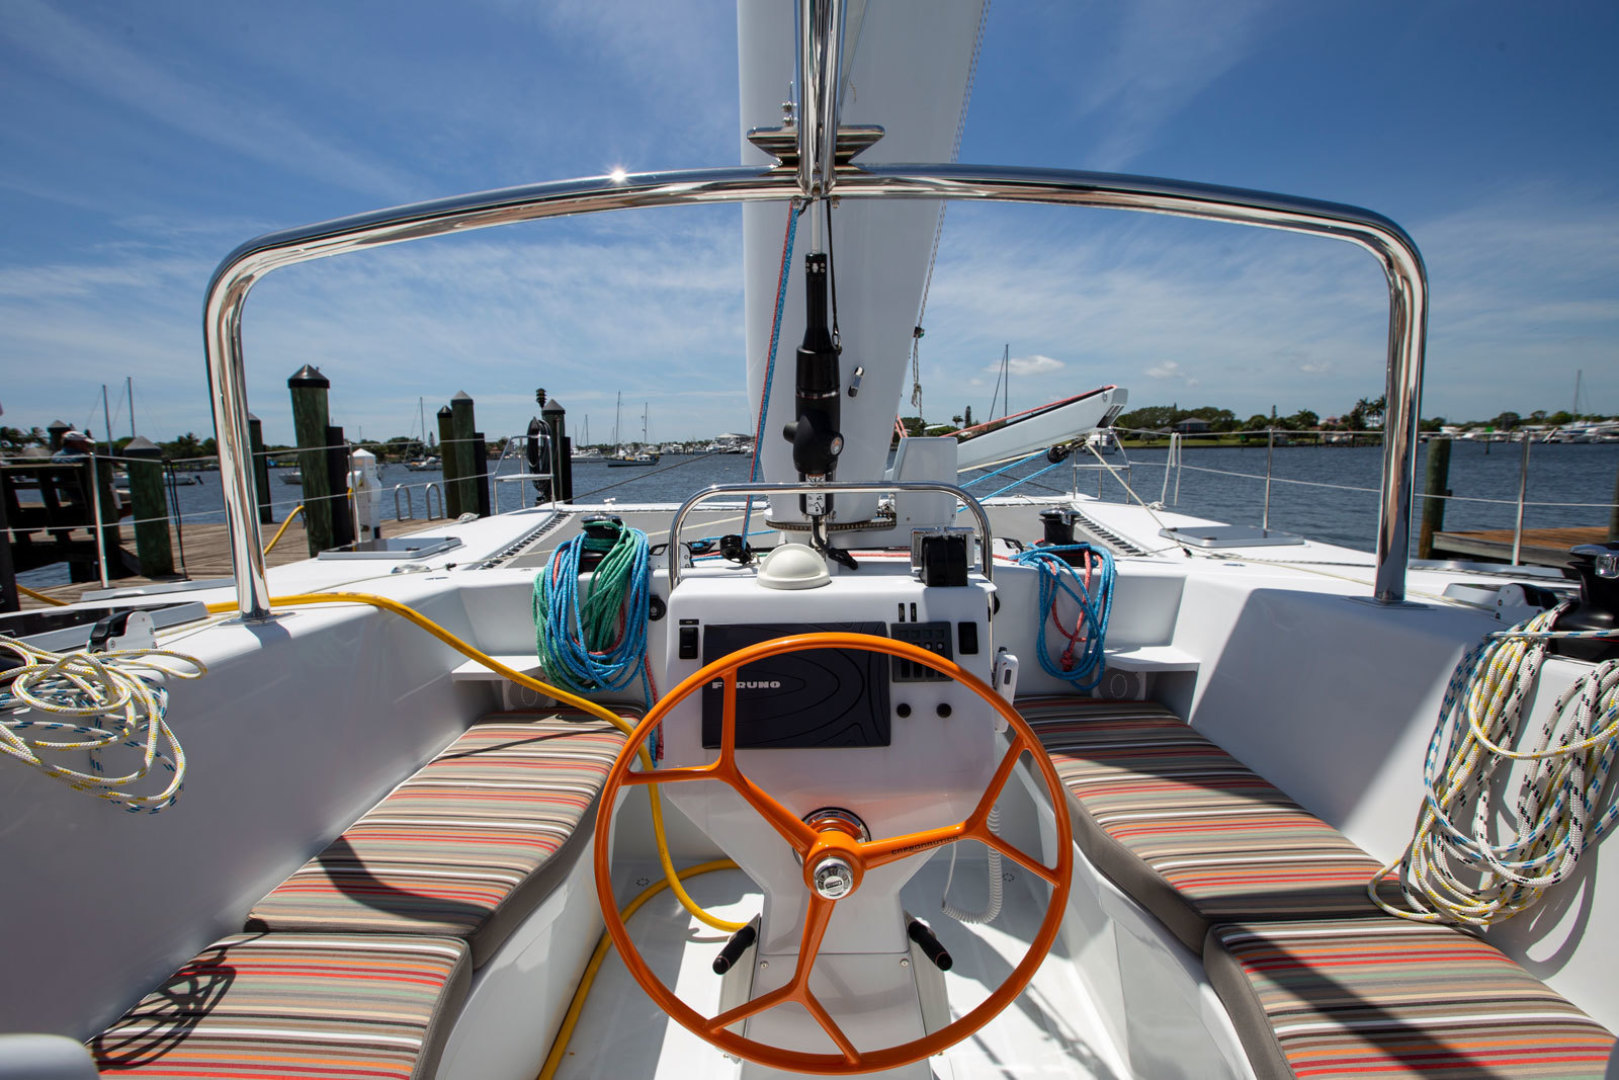 Atlantic-49 Catamaran 2018-Wabi Sabi Stuart-Florida-United States-1399296 | Thumbnail